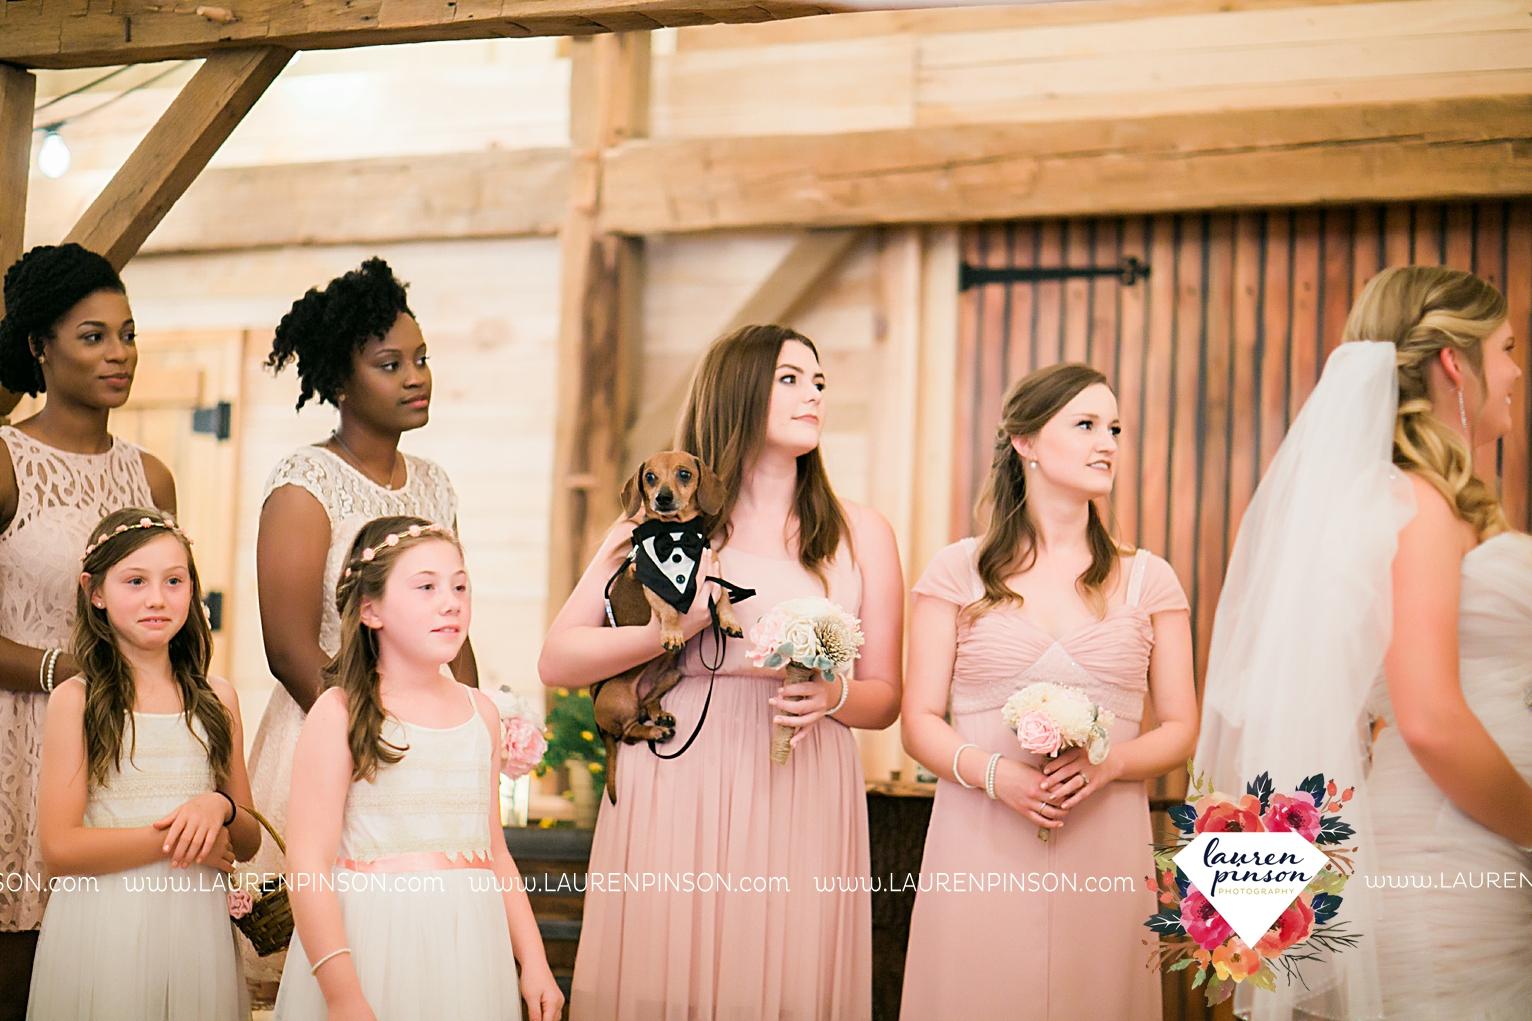 weatherford-texas-hollow-hill-farm-event-wedding-mineral-wells-dfw-wedding-photographer-wichita-falls-photography_3161.jpg